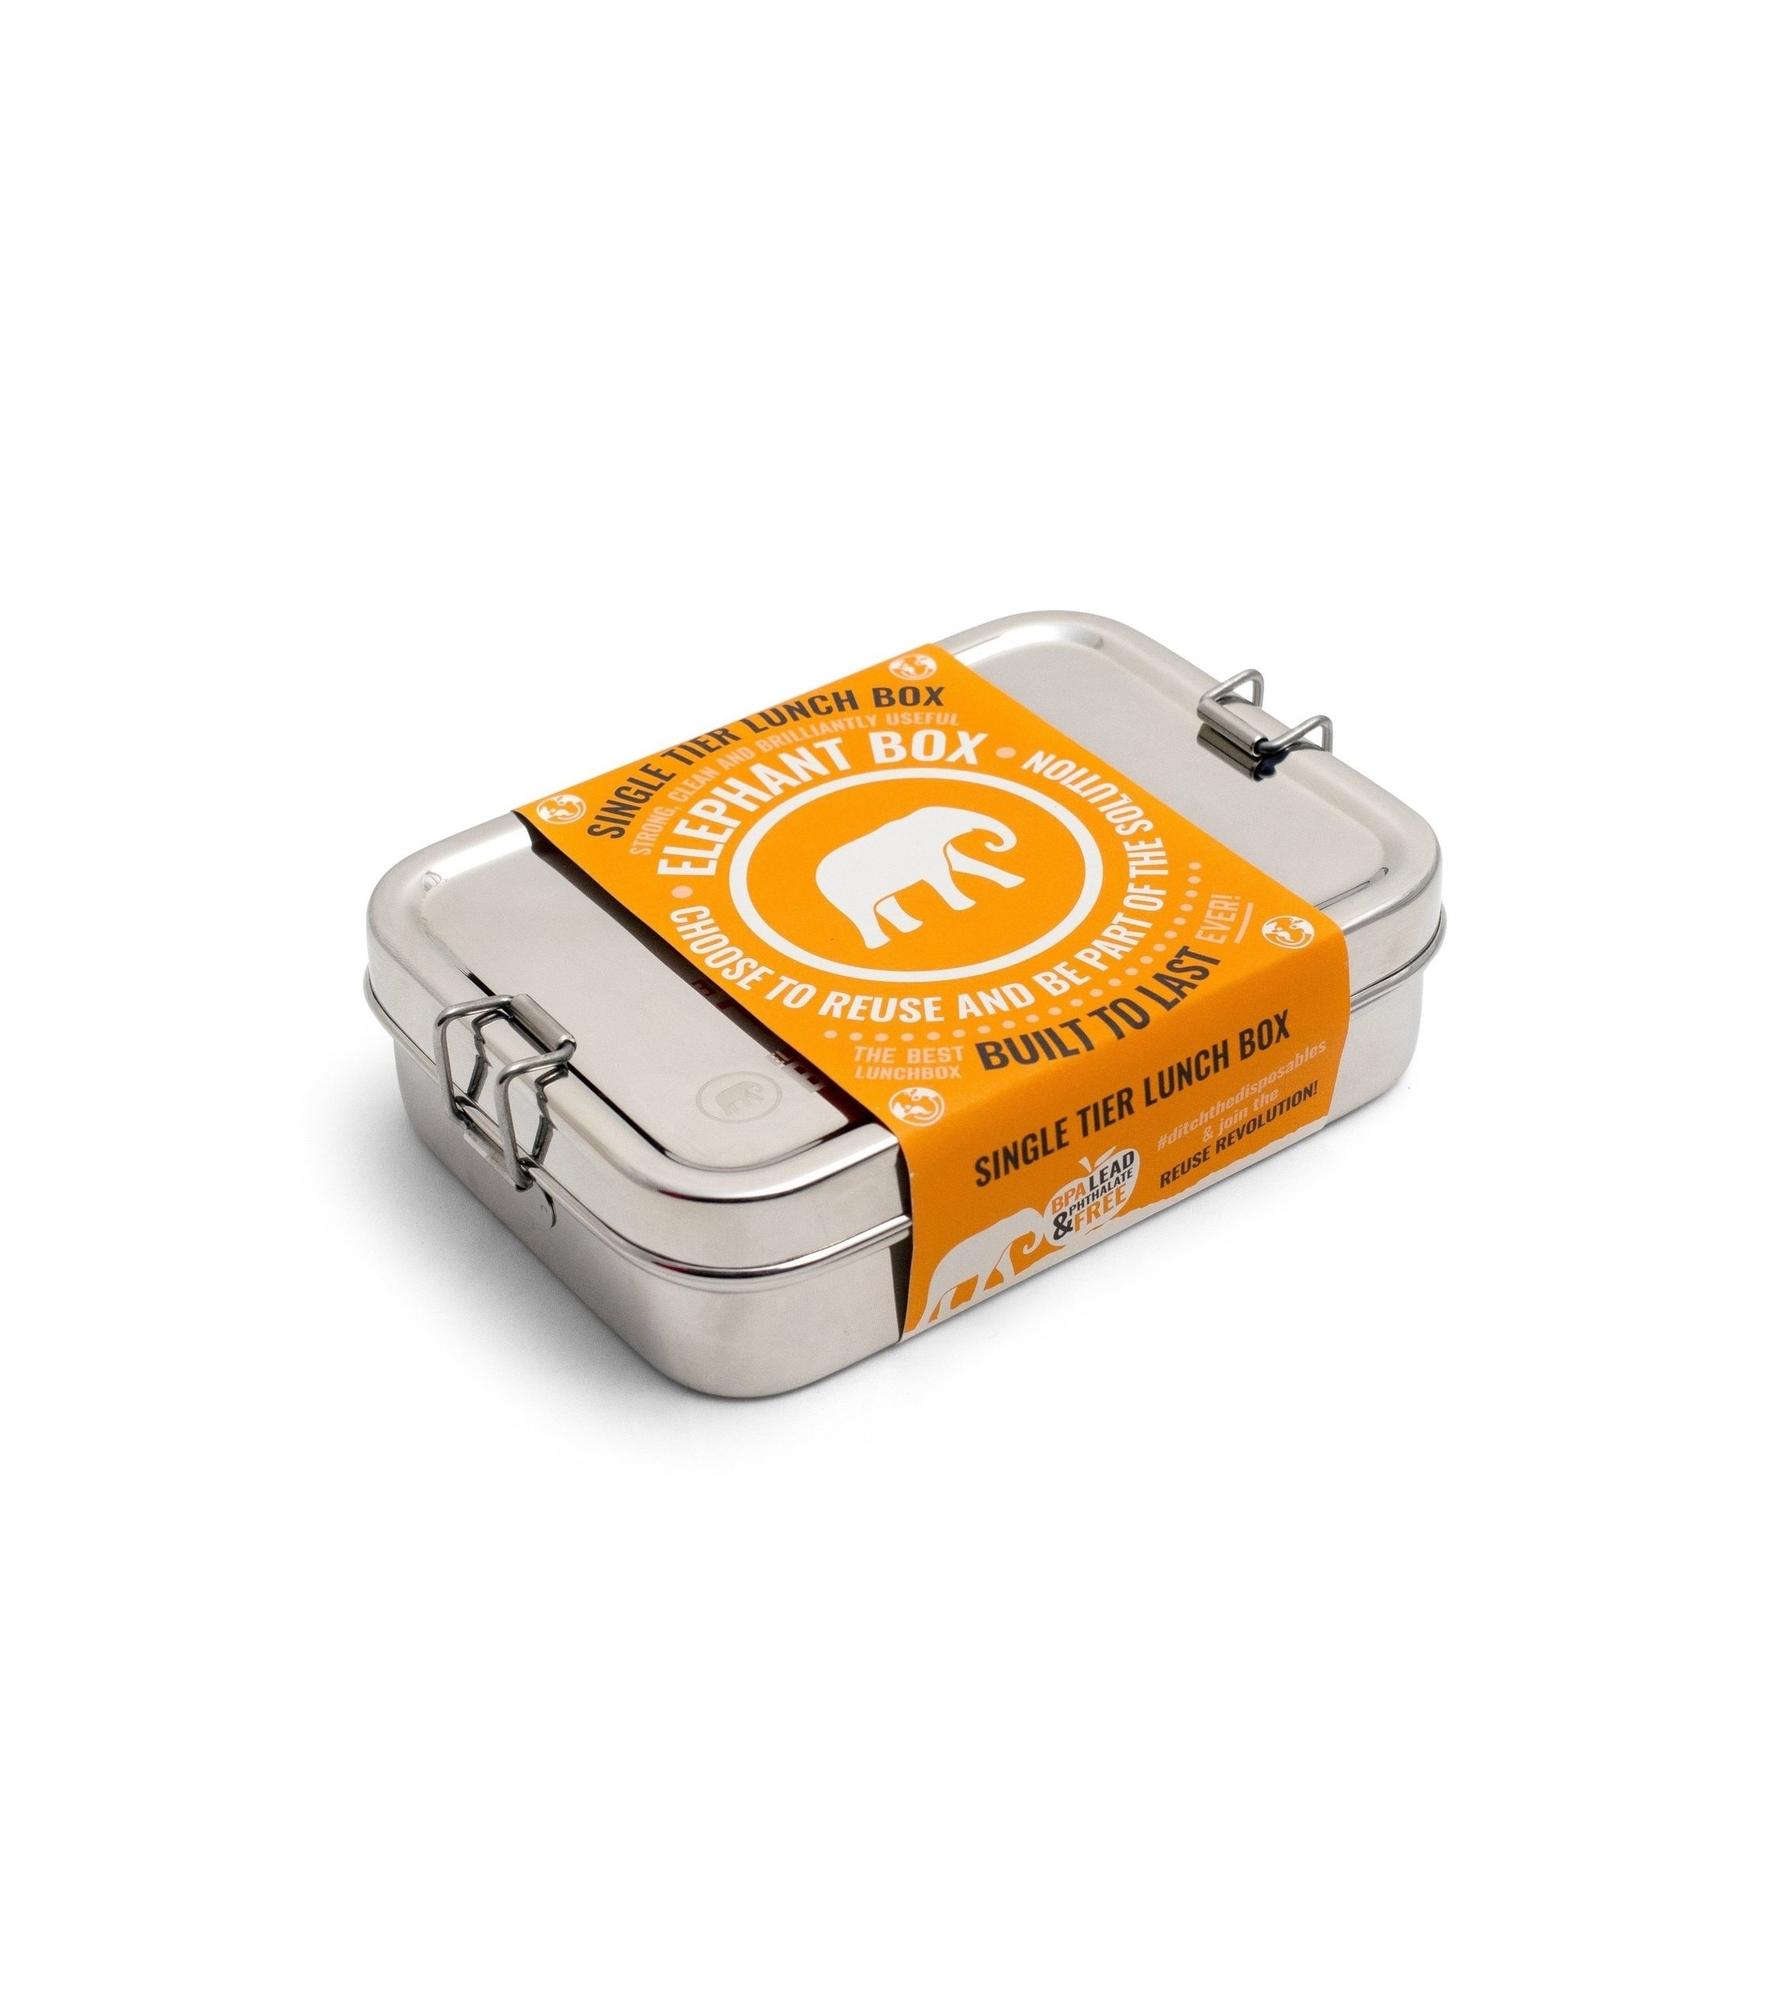 elephant-box-plastic-free-single-tier-lunch-box_edit.jpg